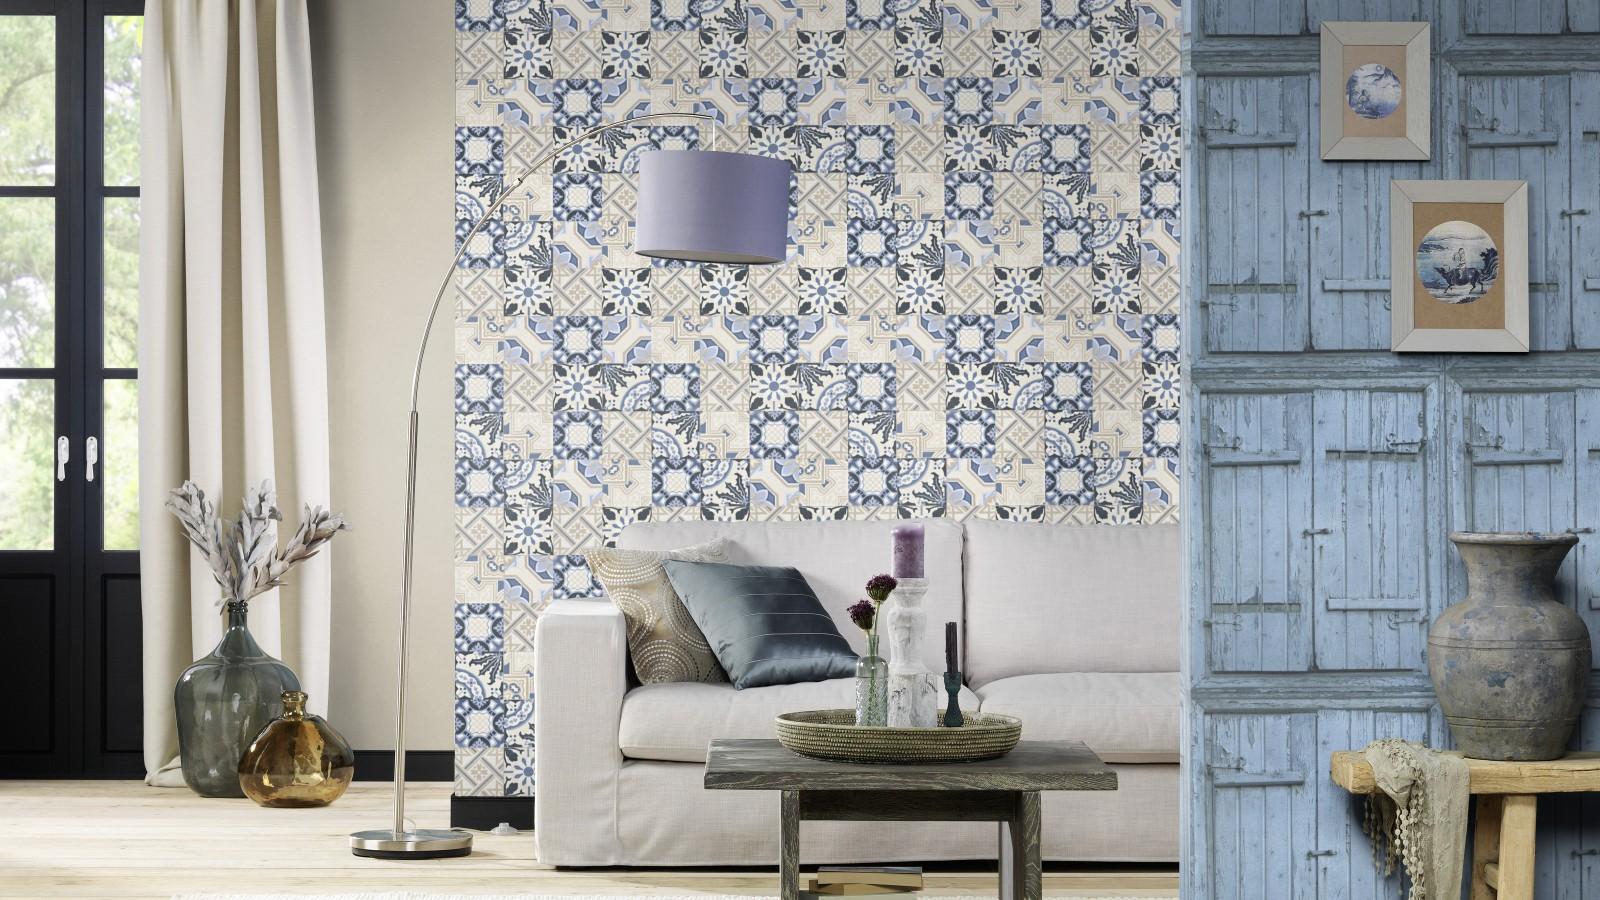 tapete rasch crispy paper fliesen blau beige 526325. Black Bedroom Furniture Sets. Home Design Ideas